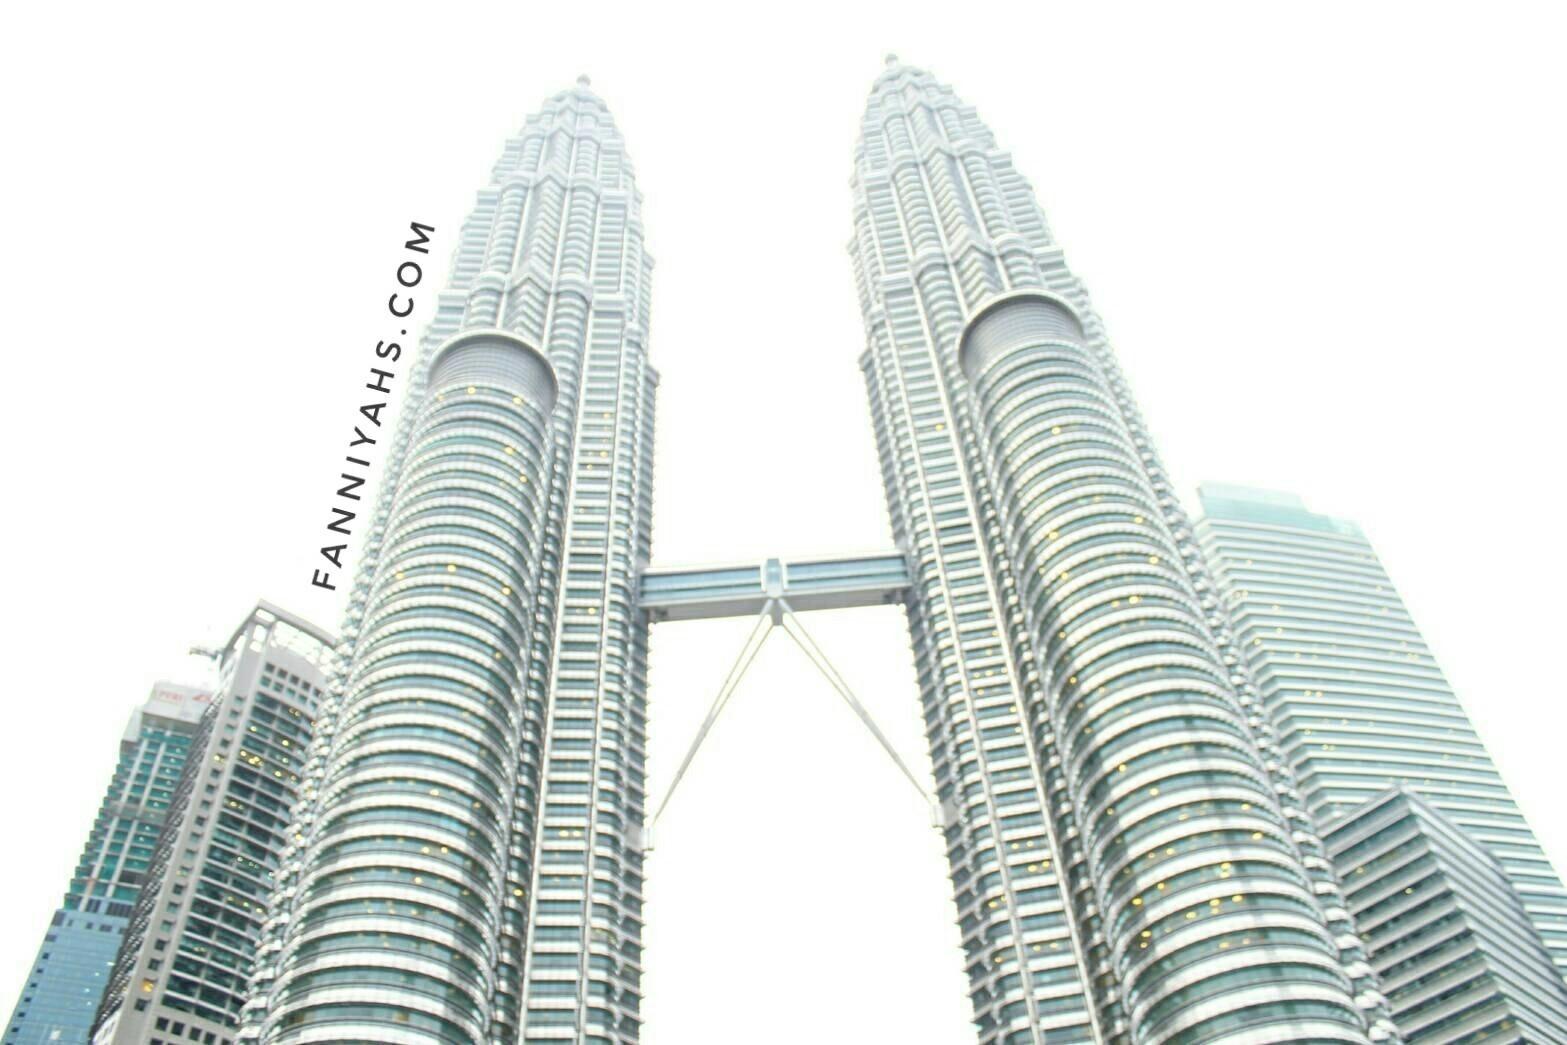 tempat wisata di kuala lumpur tempat wisata di malaysia wisata kuala rh fanniyahs com